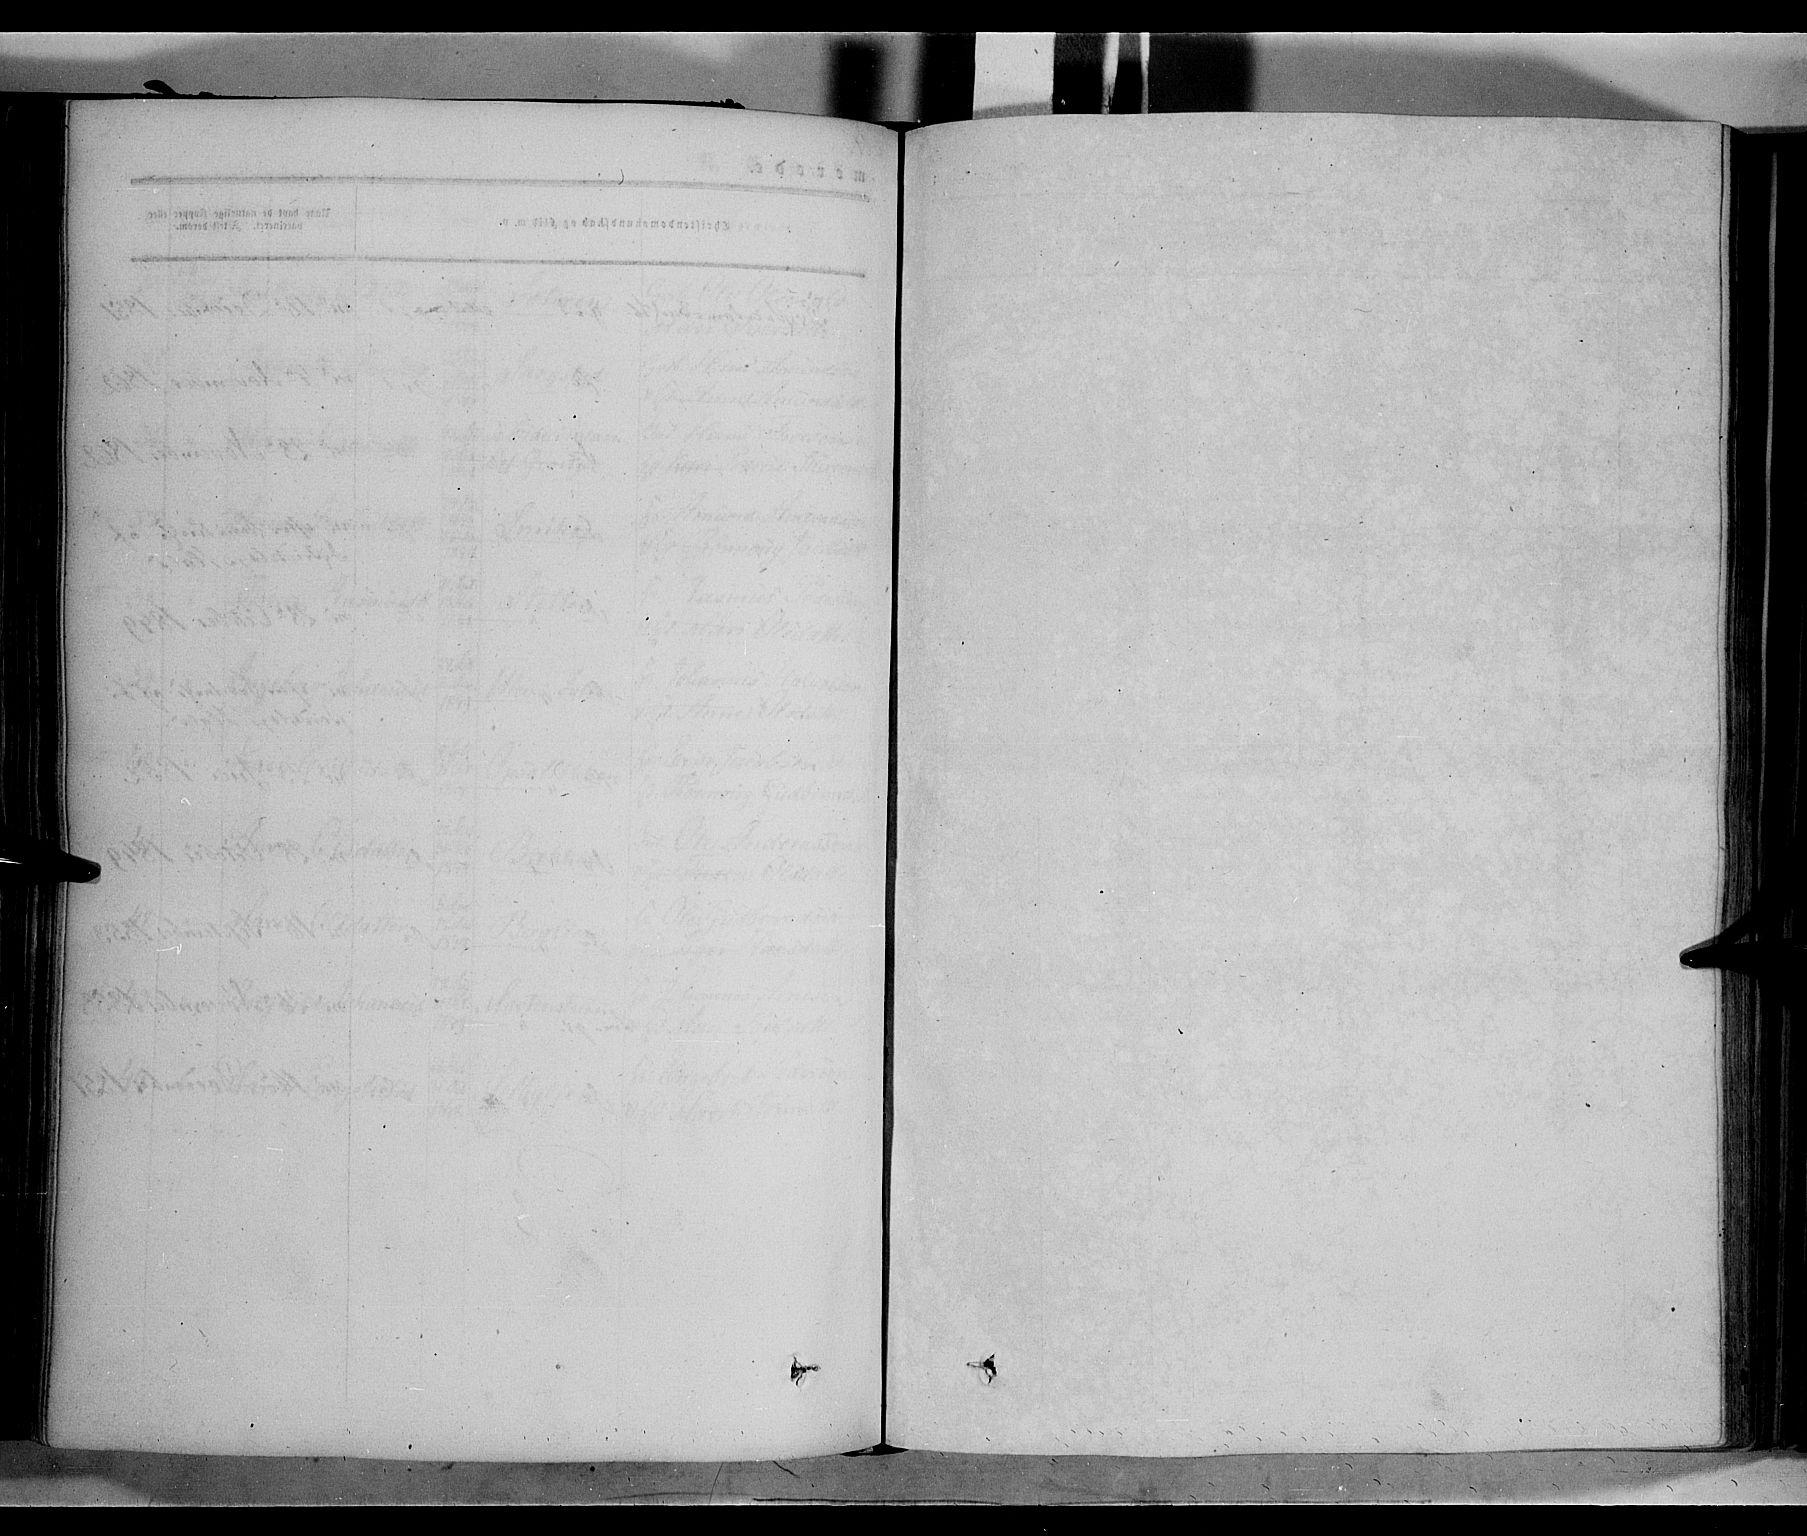 SAH, Nord-Fron prestekontor, Ministerialbok nr. 1, 1851-1864